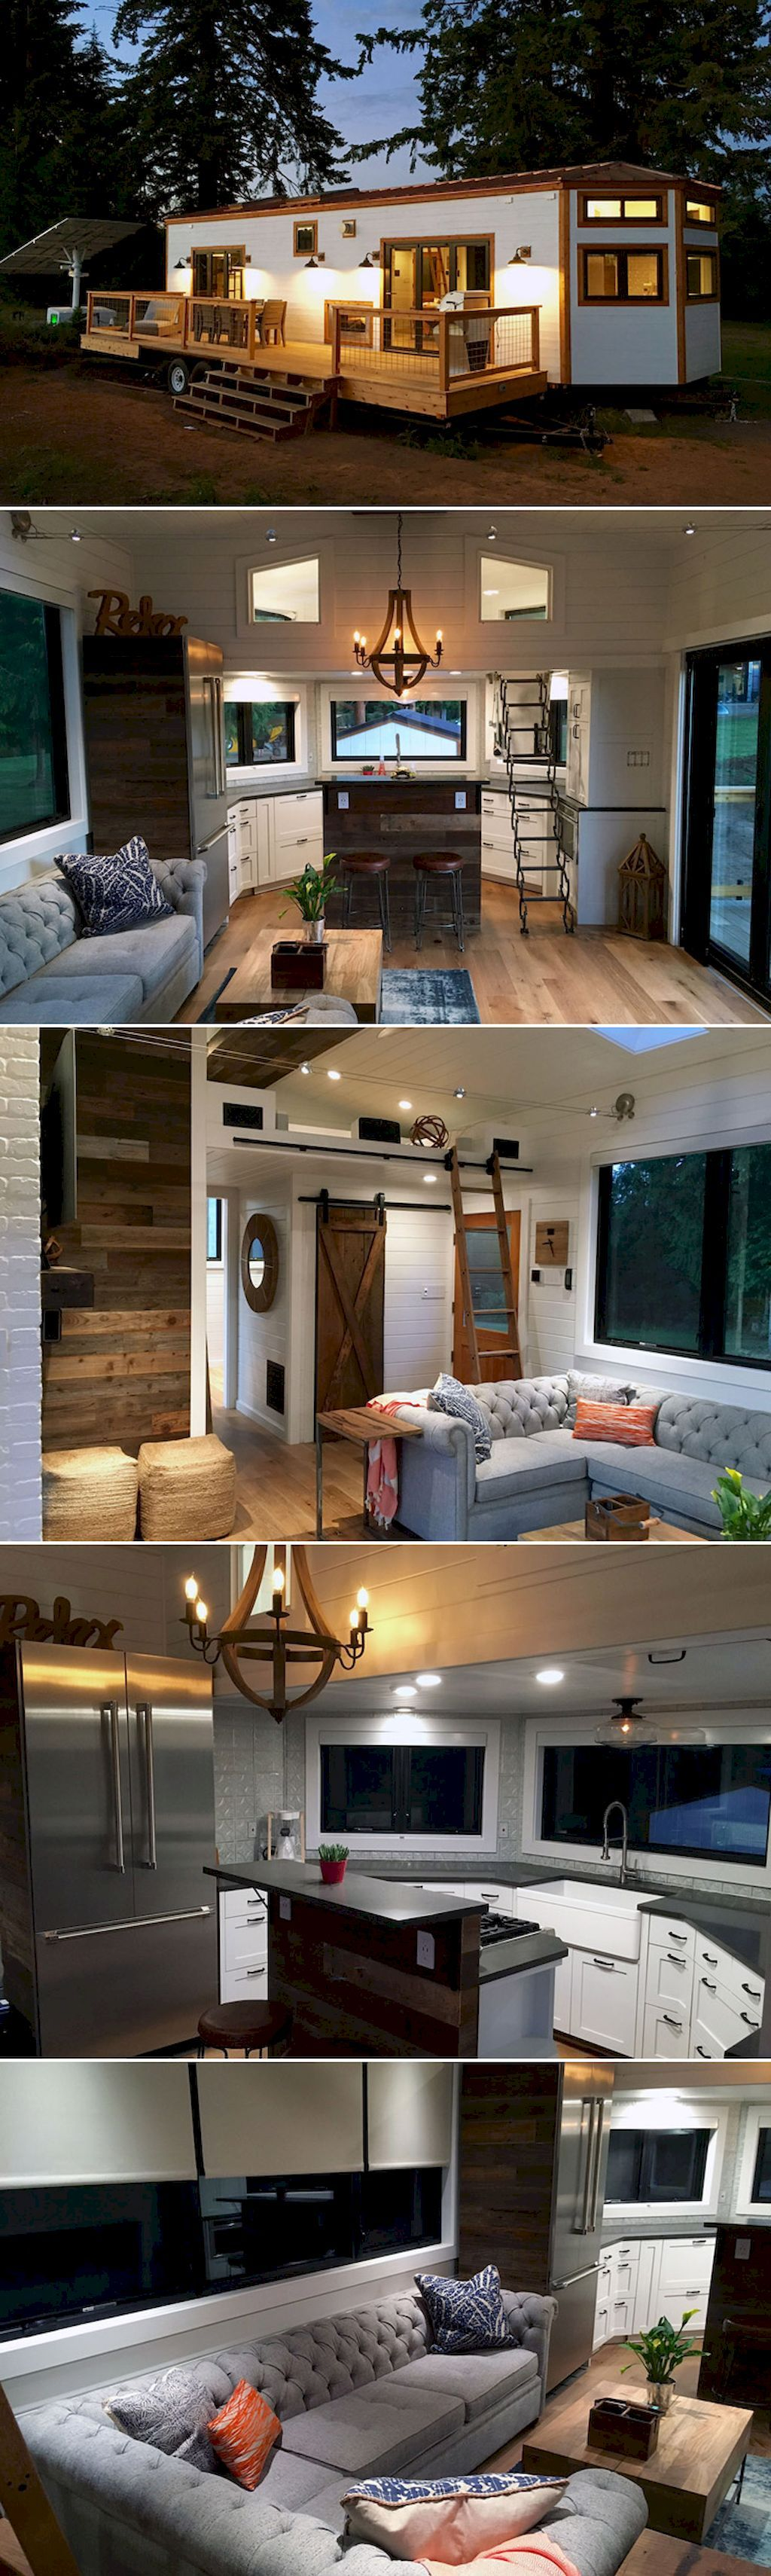 65 Cute Tiny House Ideas U0026 Organization Tips   Roomaniac.com